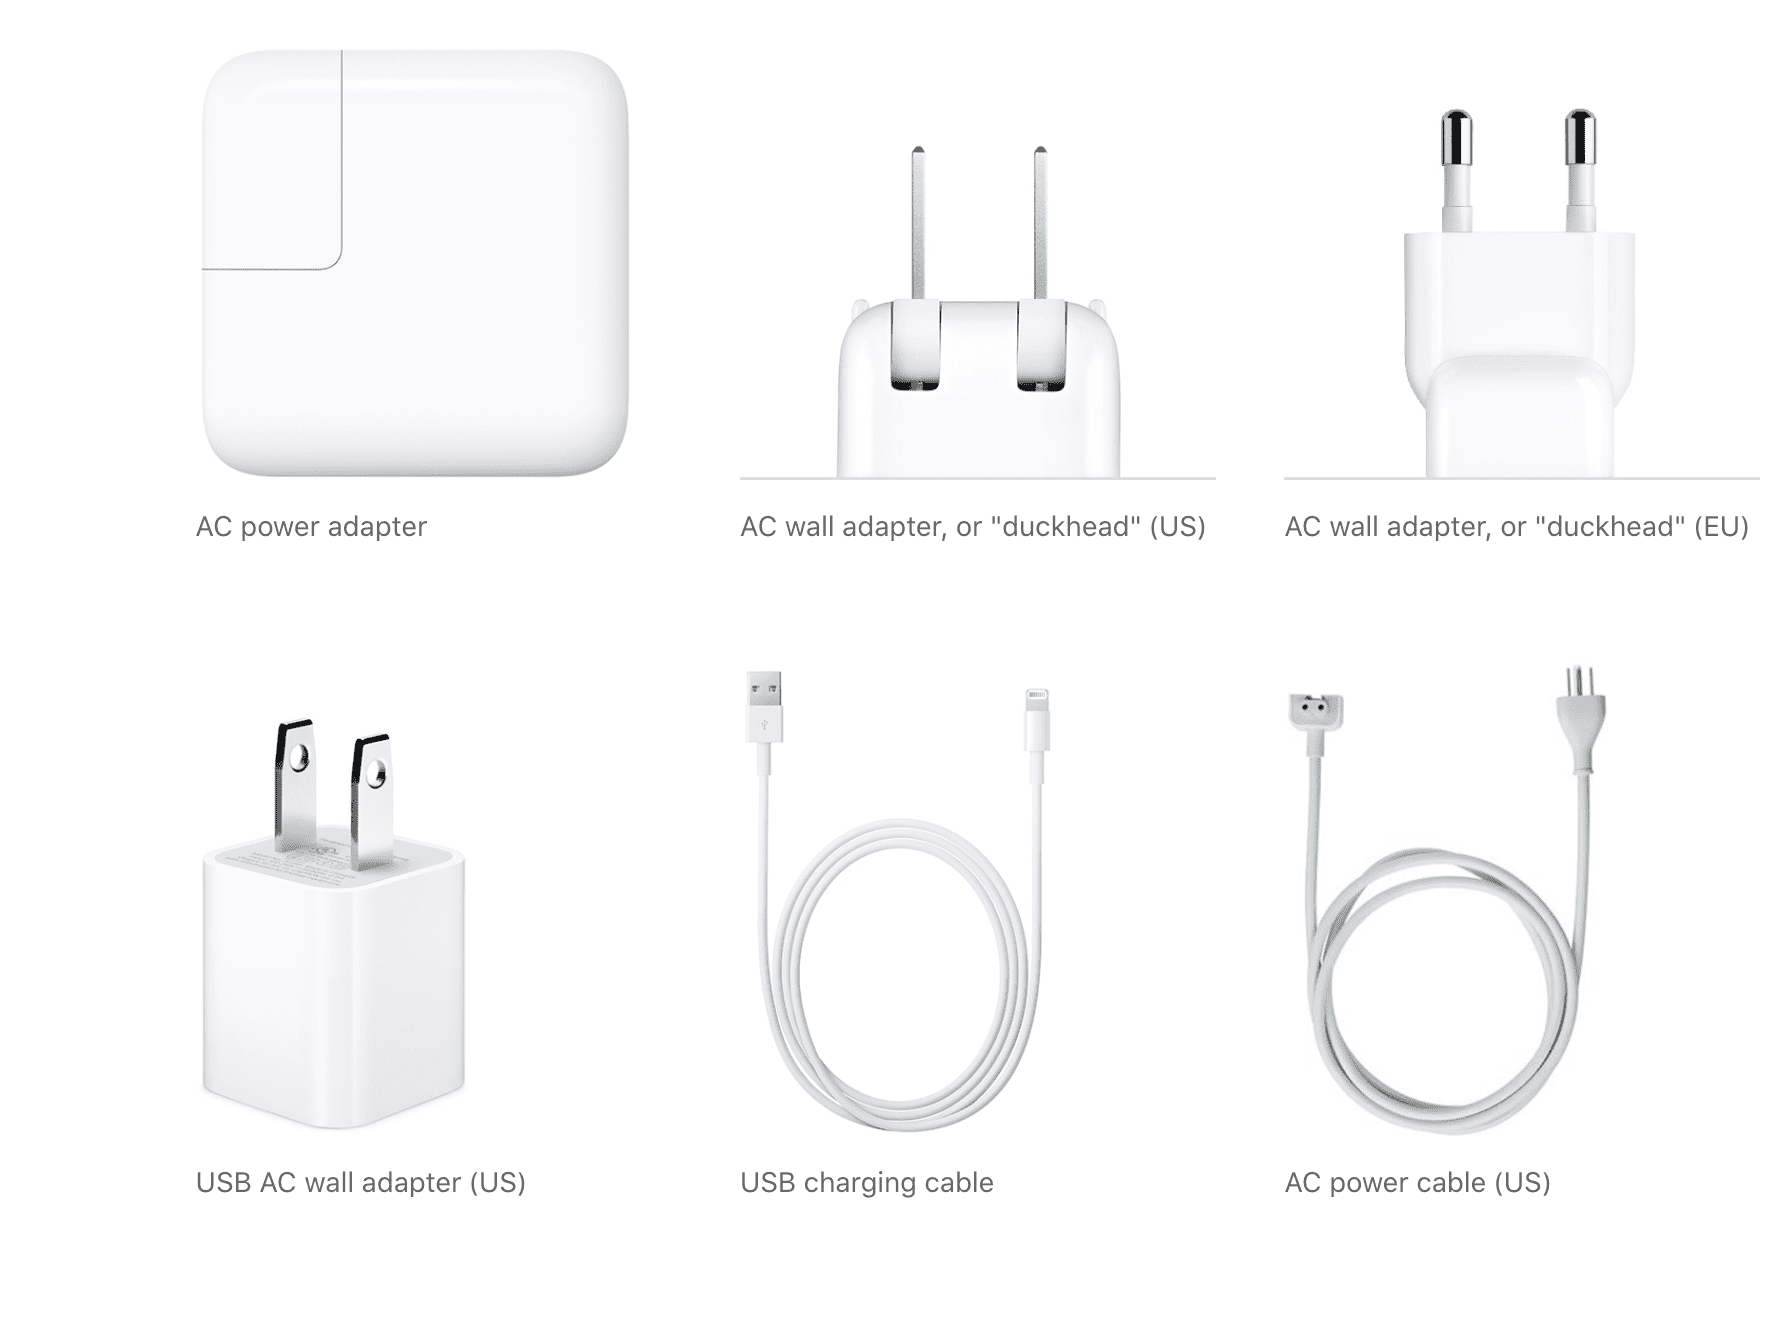 Apple Power Adapters